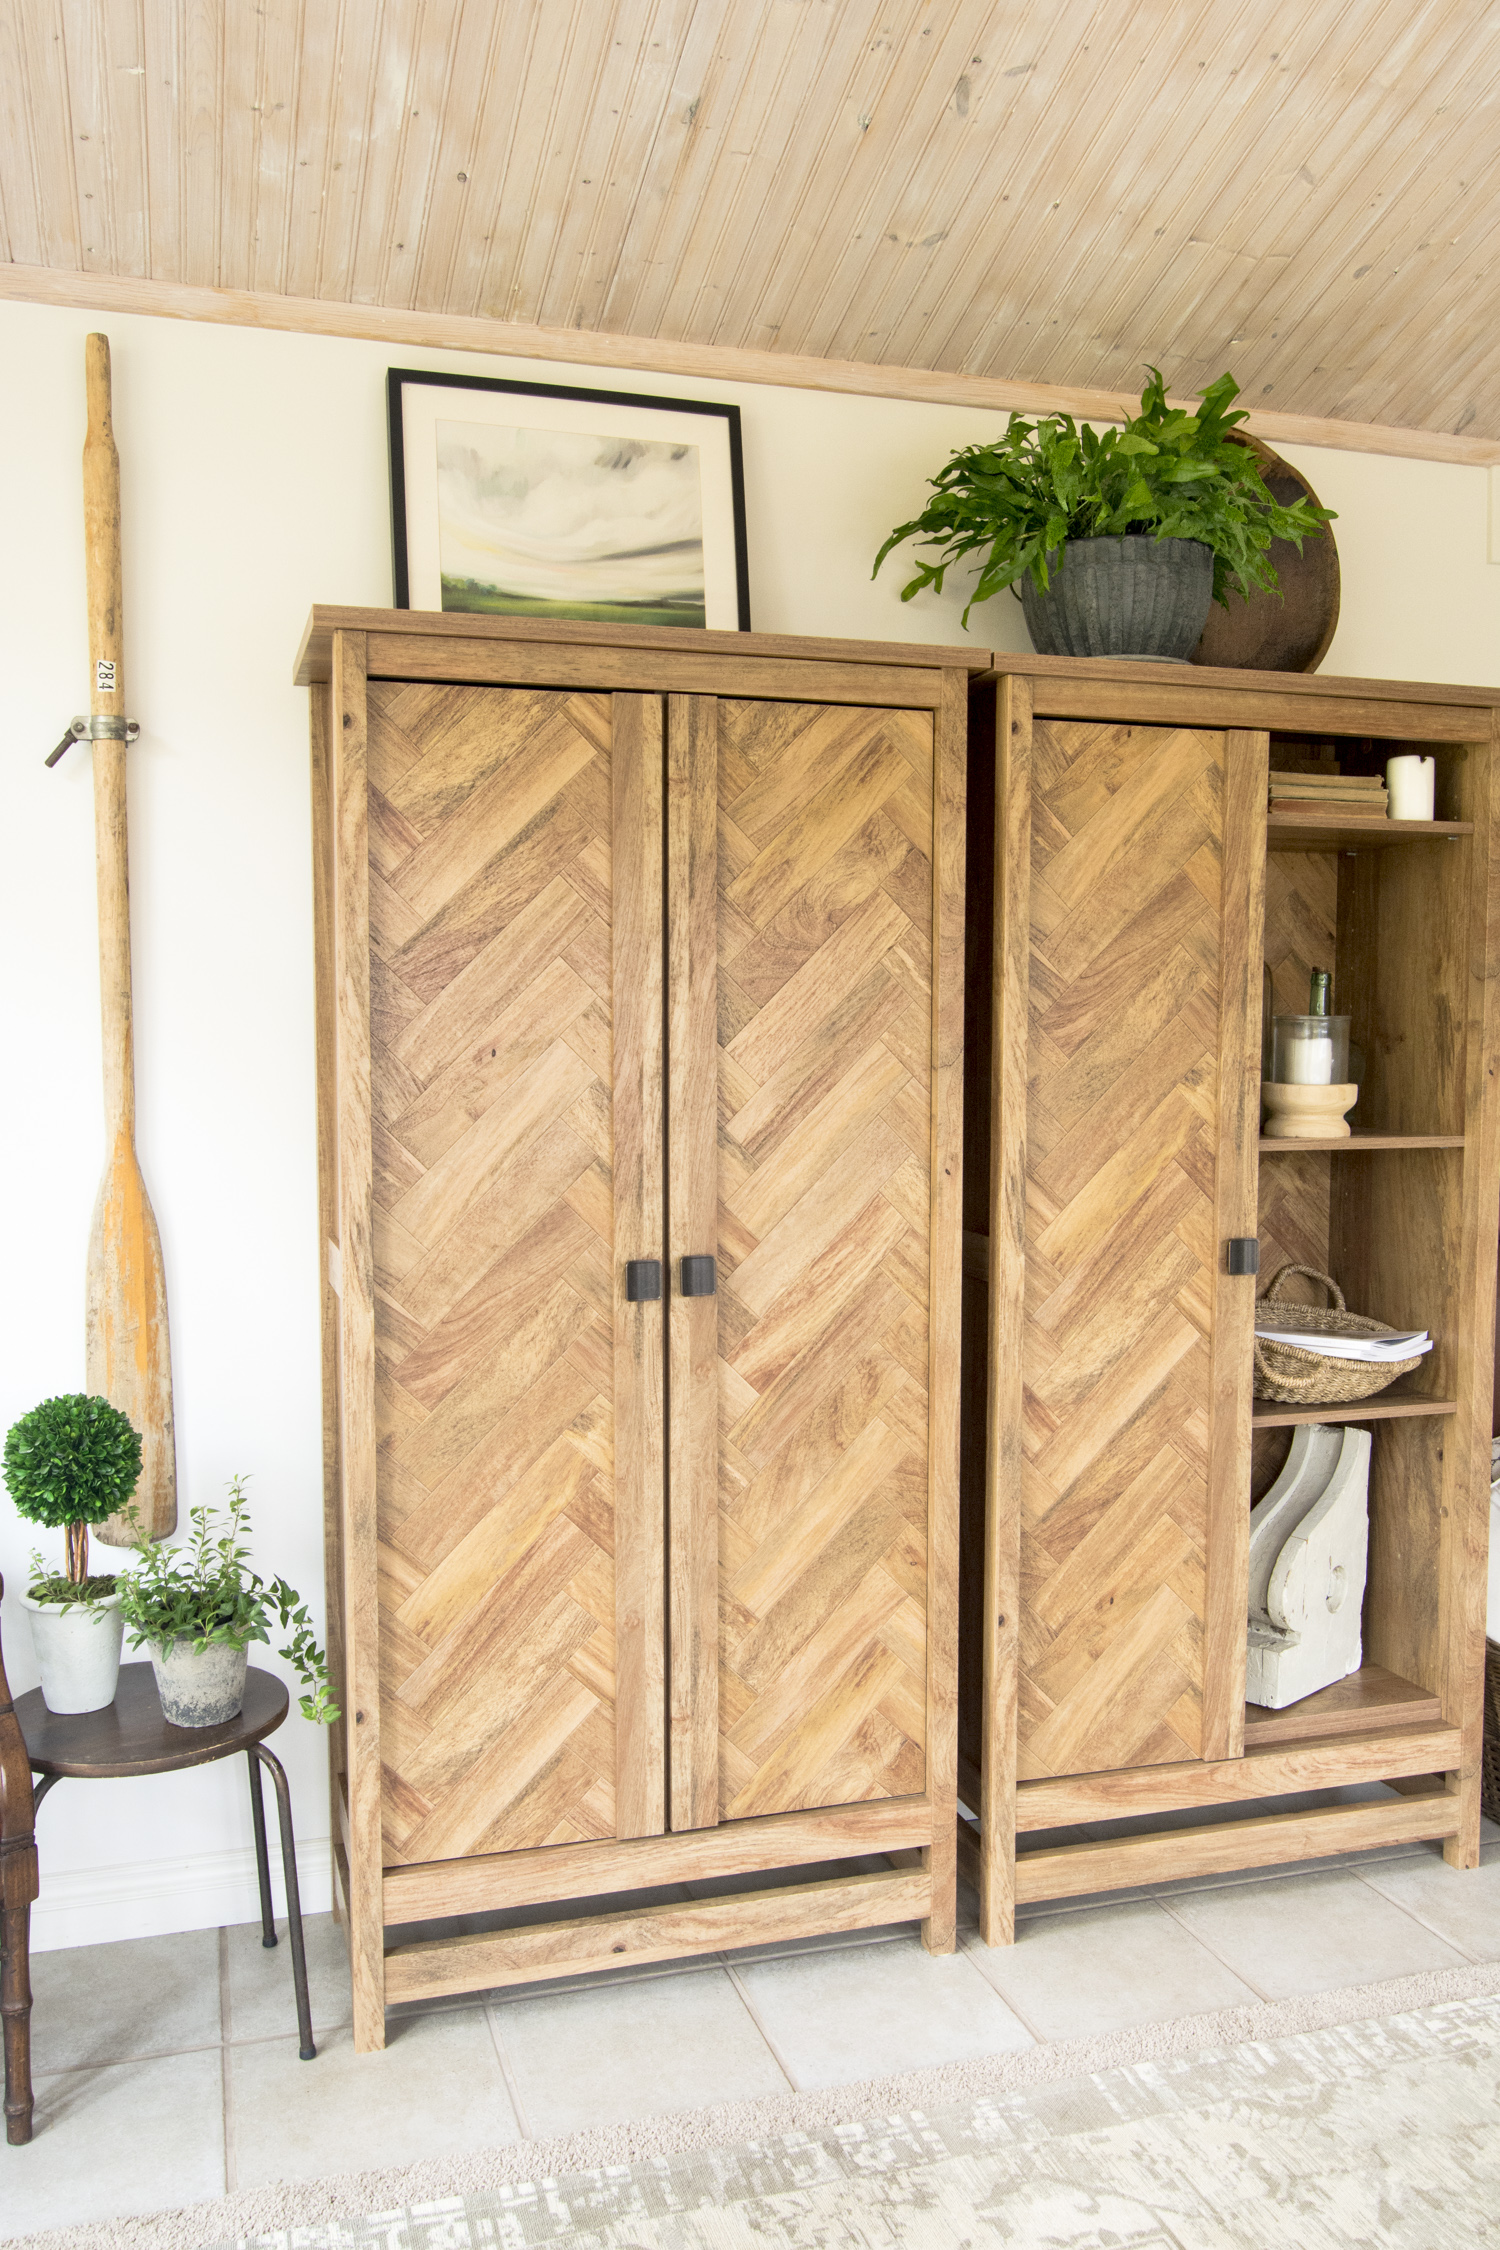 Wood storage cabinets.